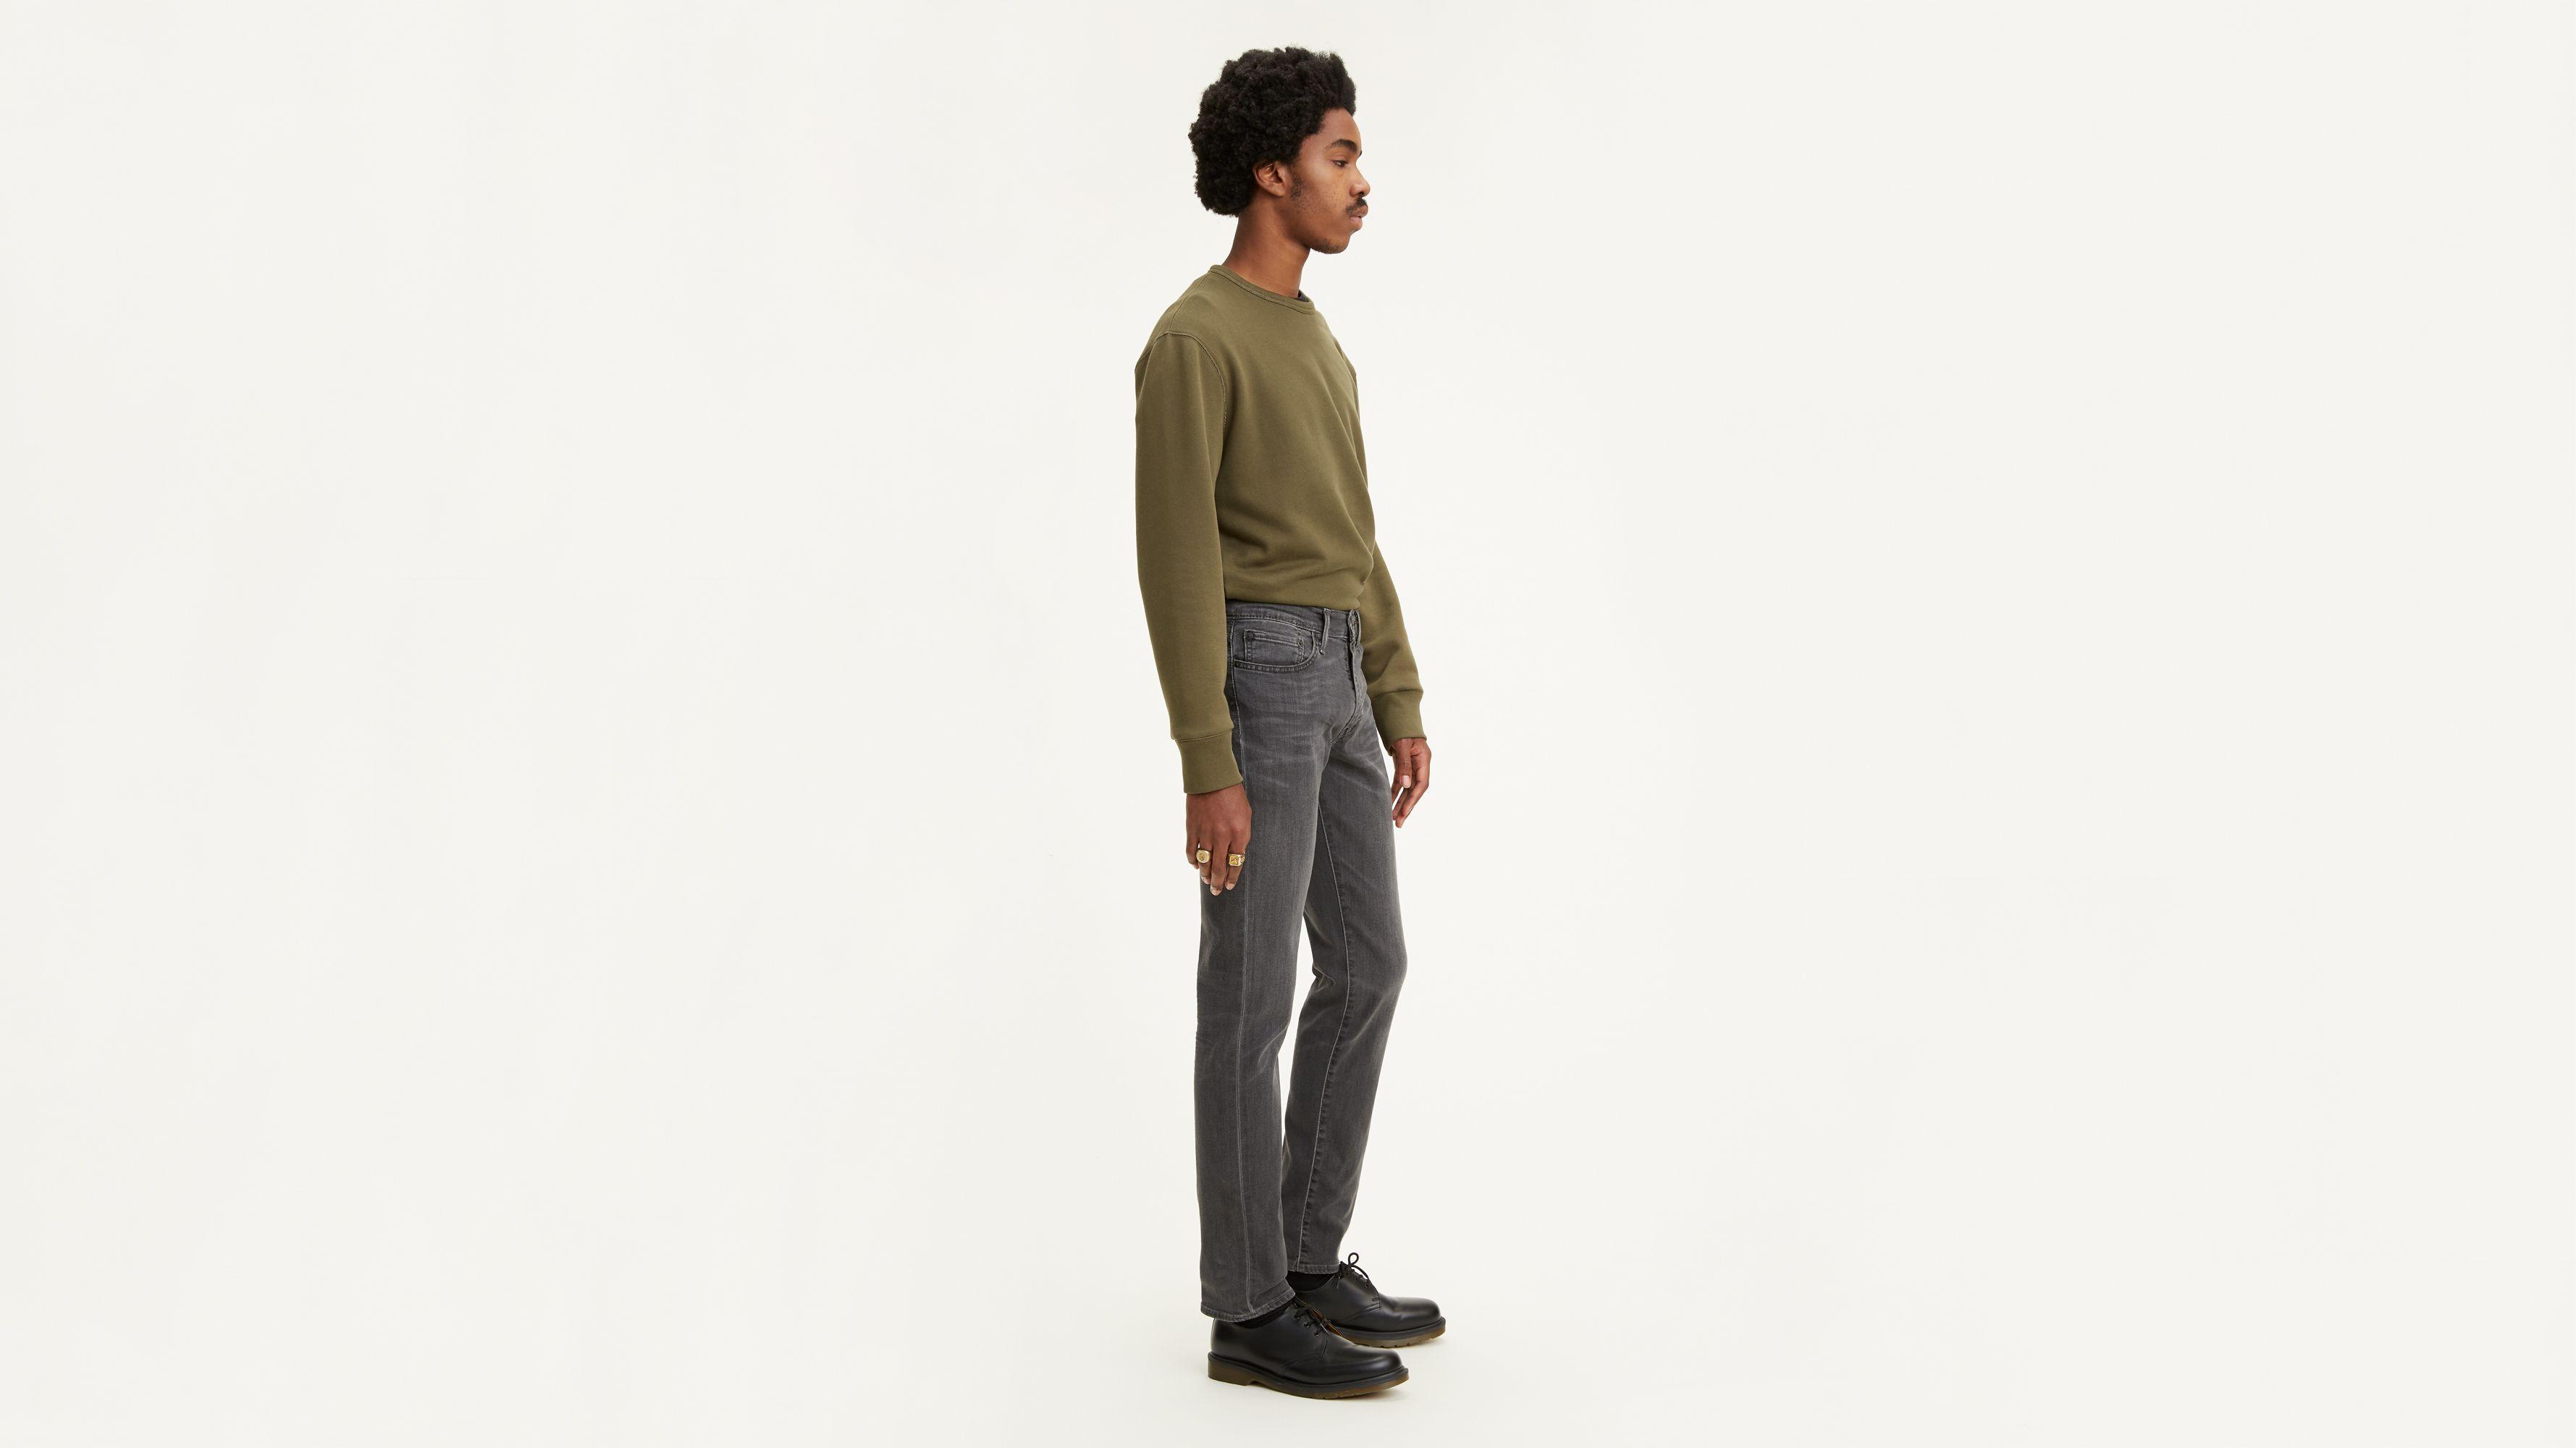 Fseason-Men Basic Style Trousers Relaxed-Fit Denim Pants Curling Jeans